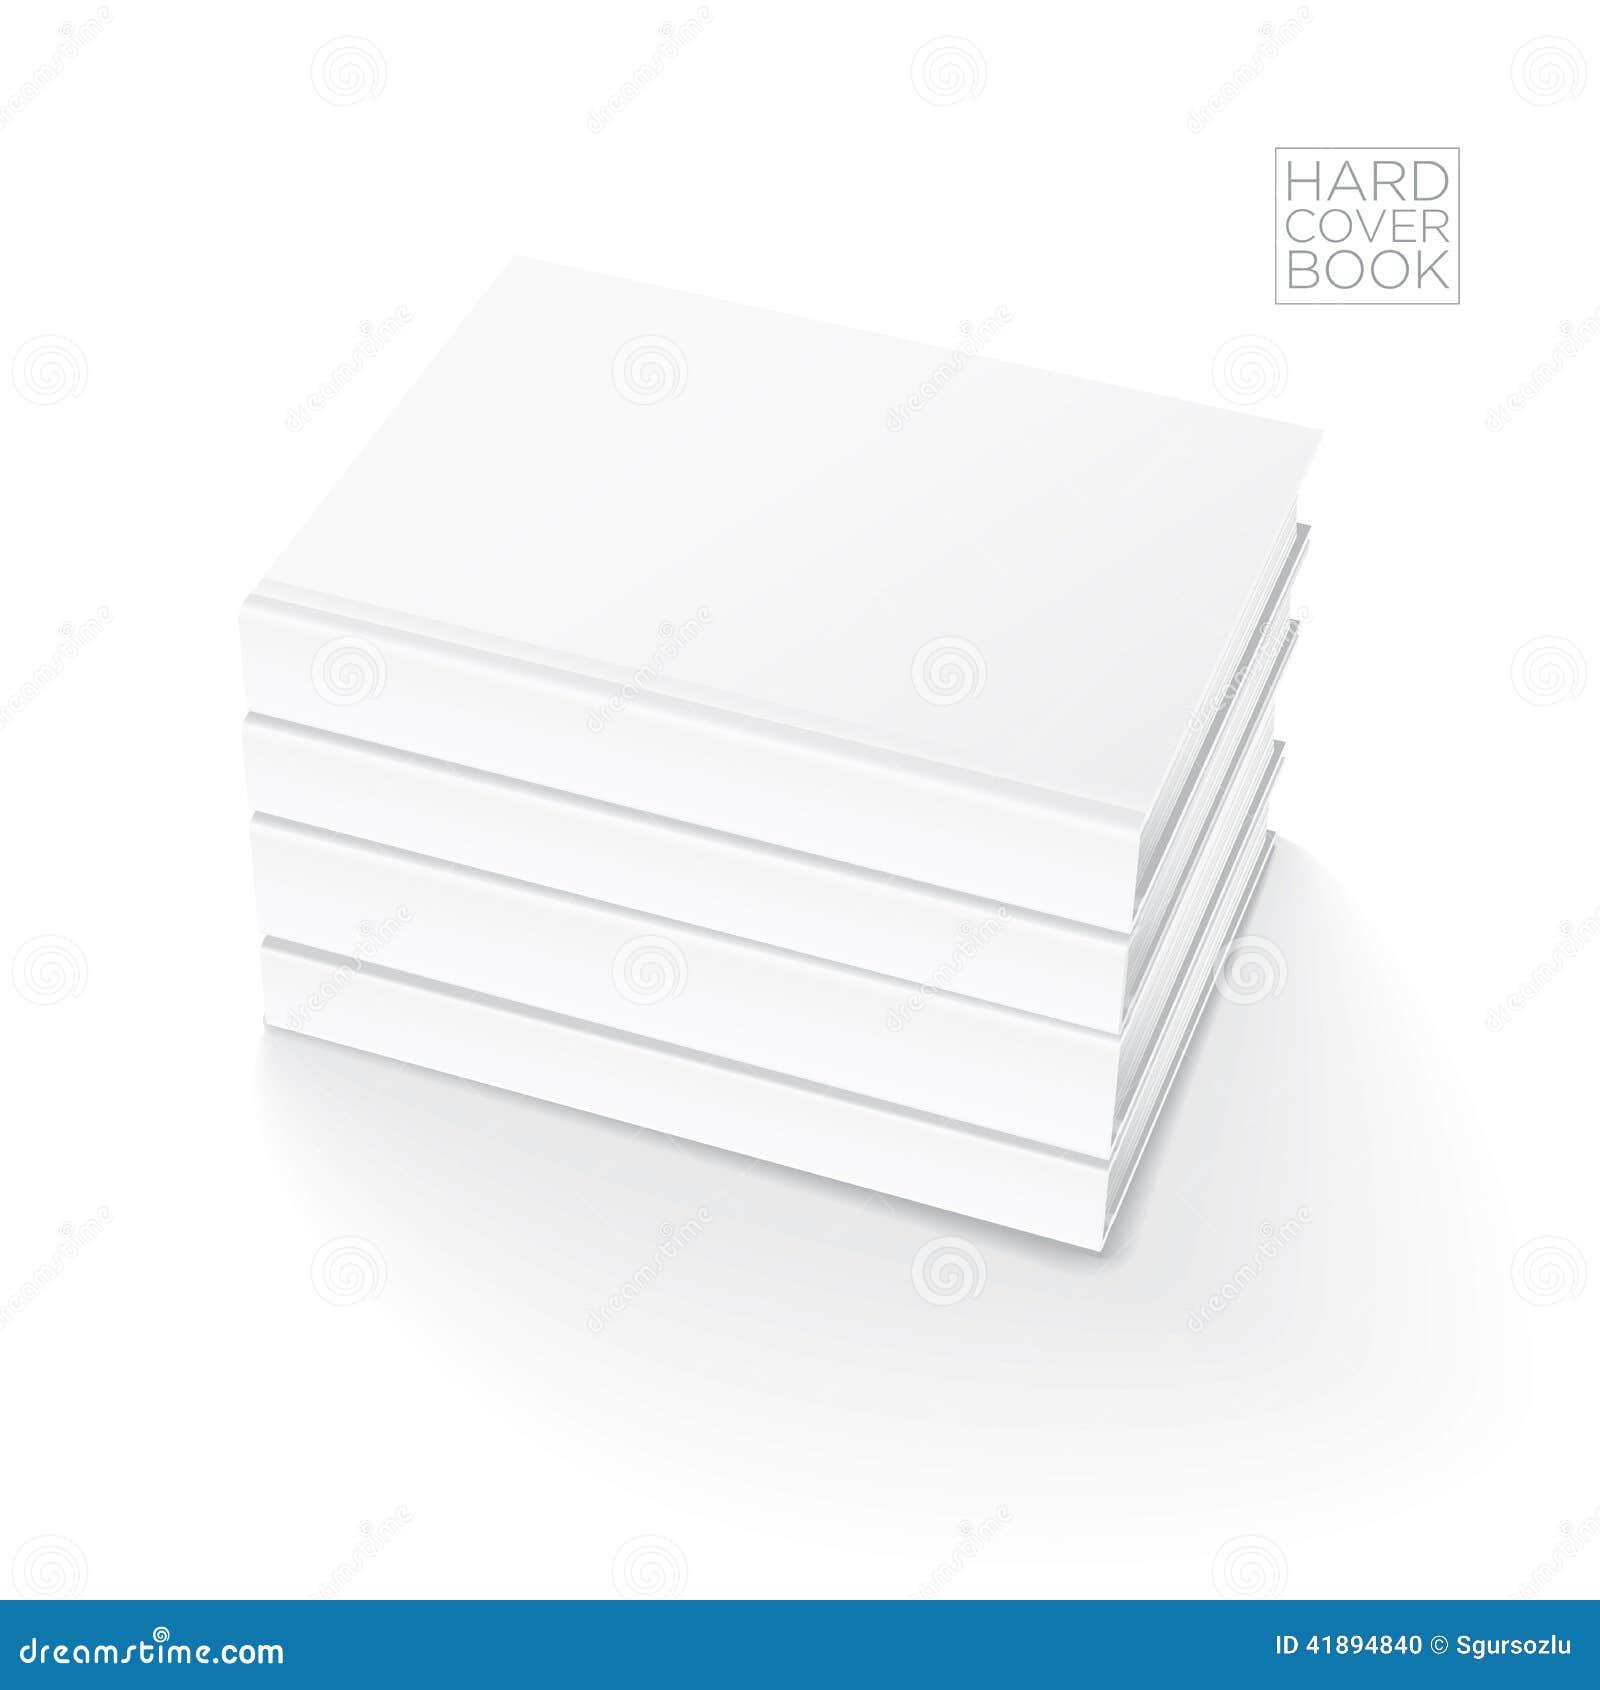 Hard Cover Book Template : Hard cover book template cartoon vector cartoondealer